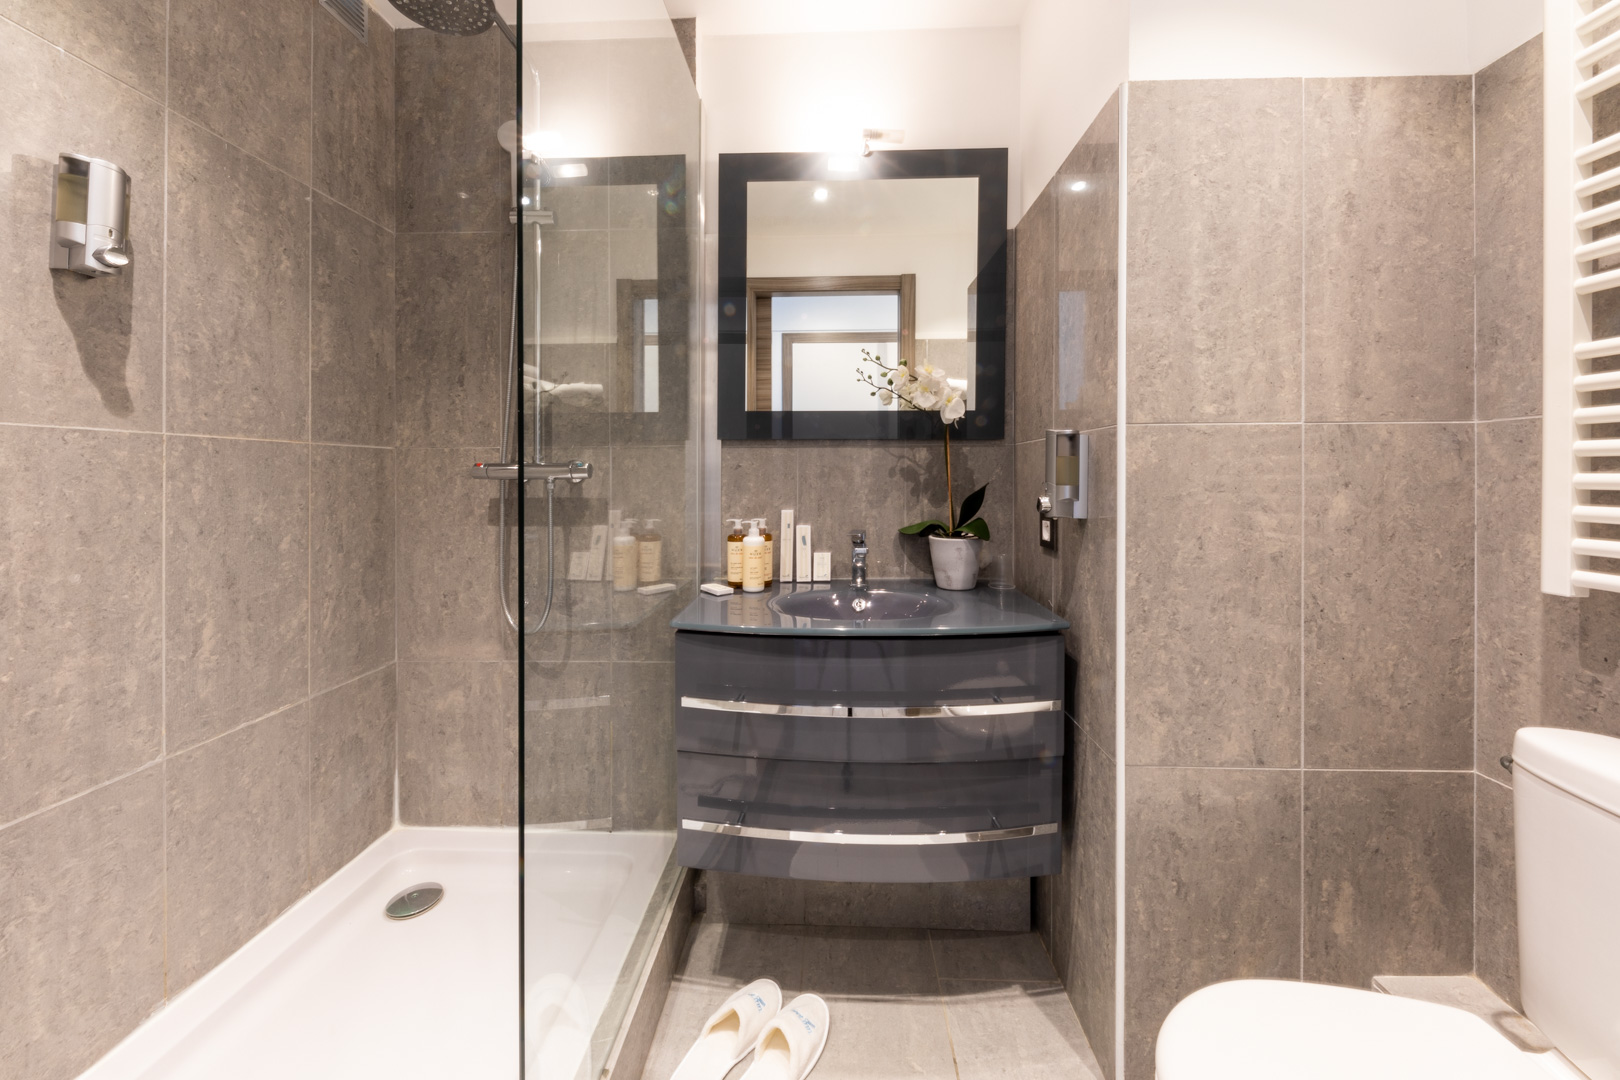 Bathroom at Sky View Terrace Apartment